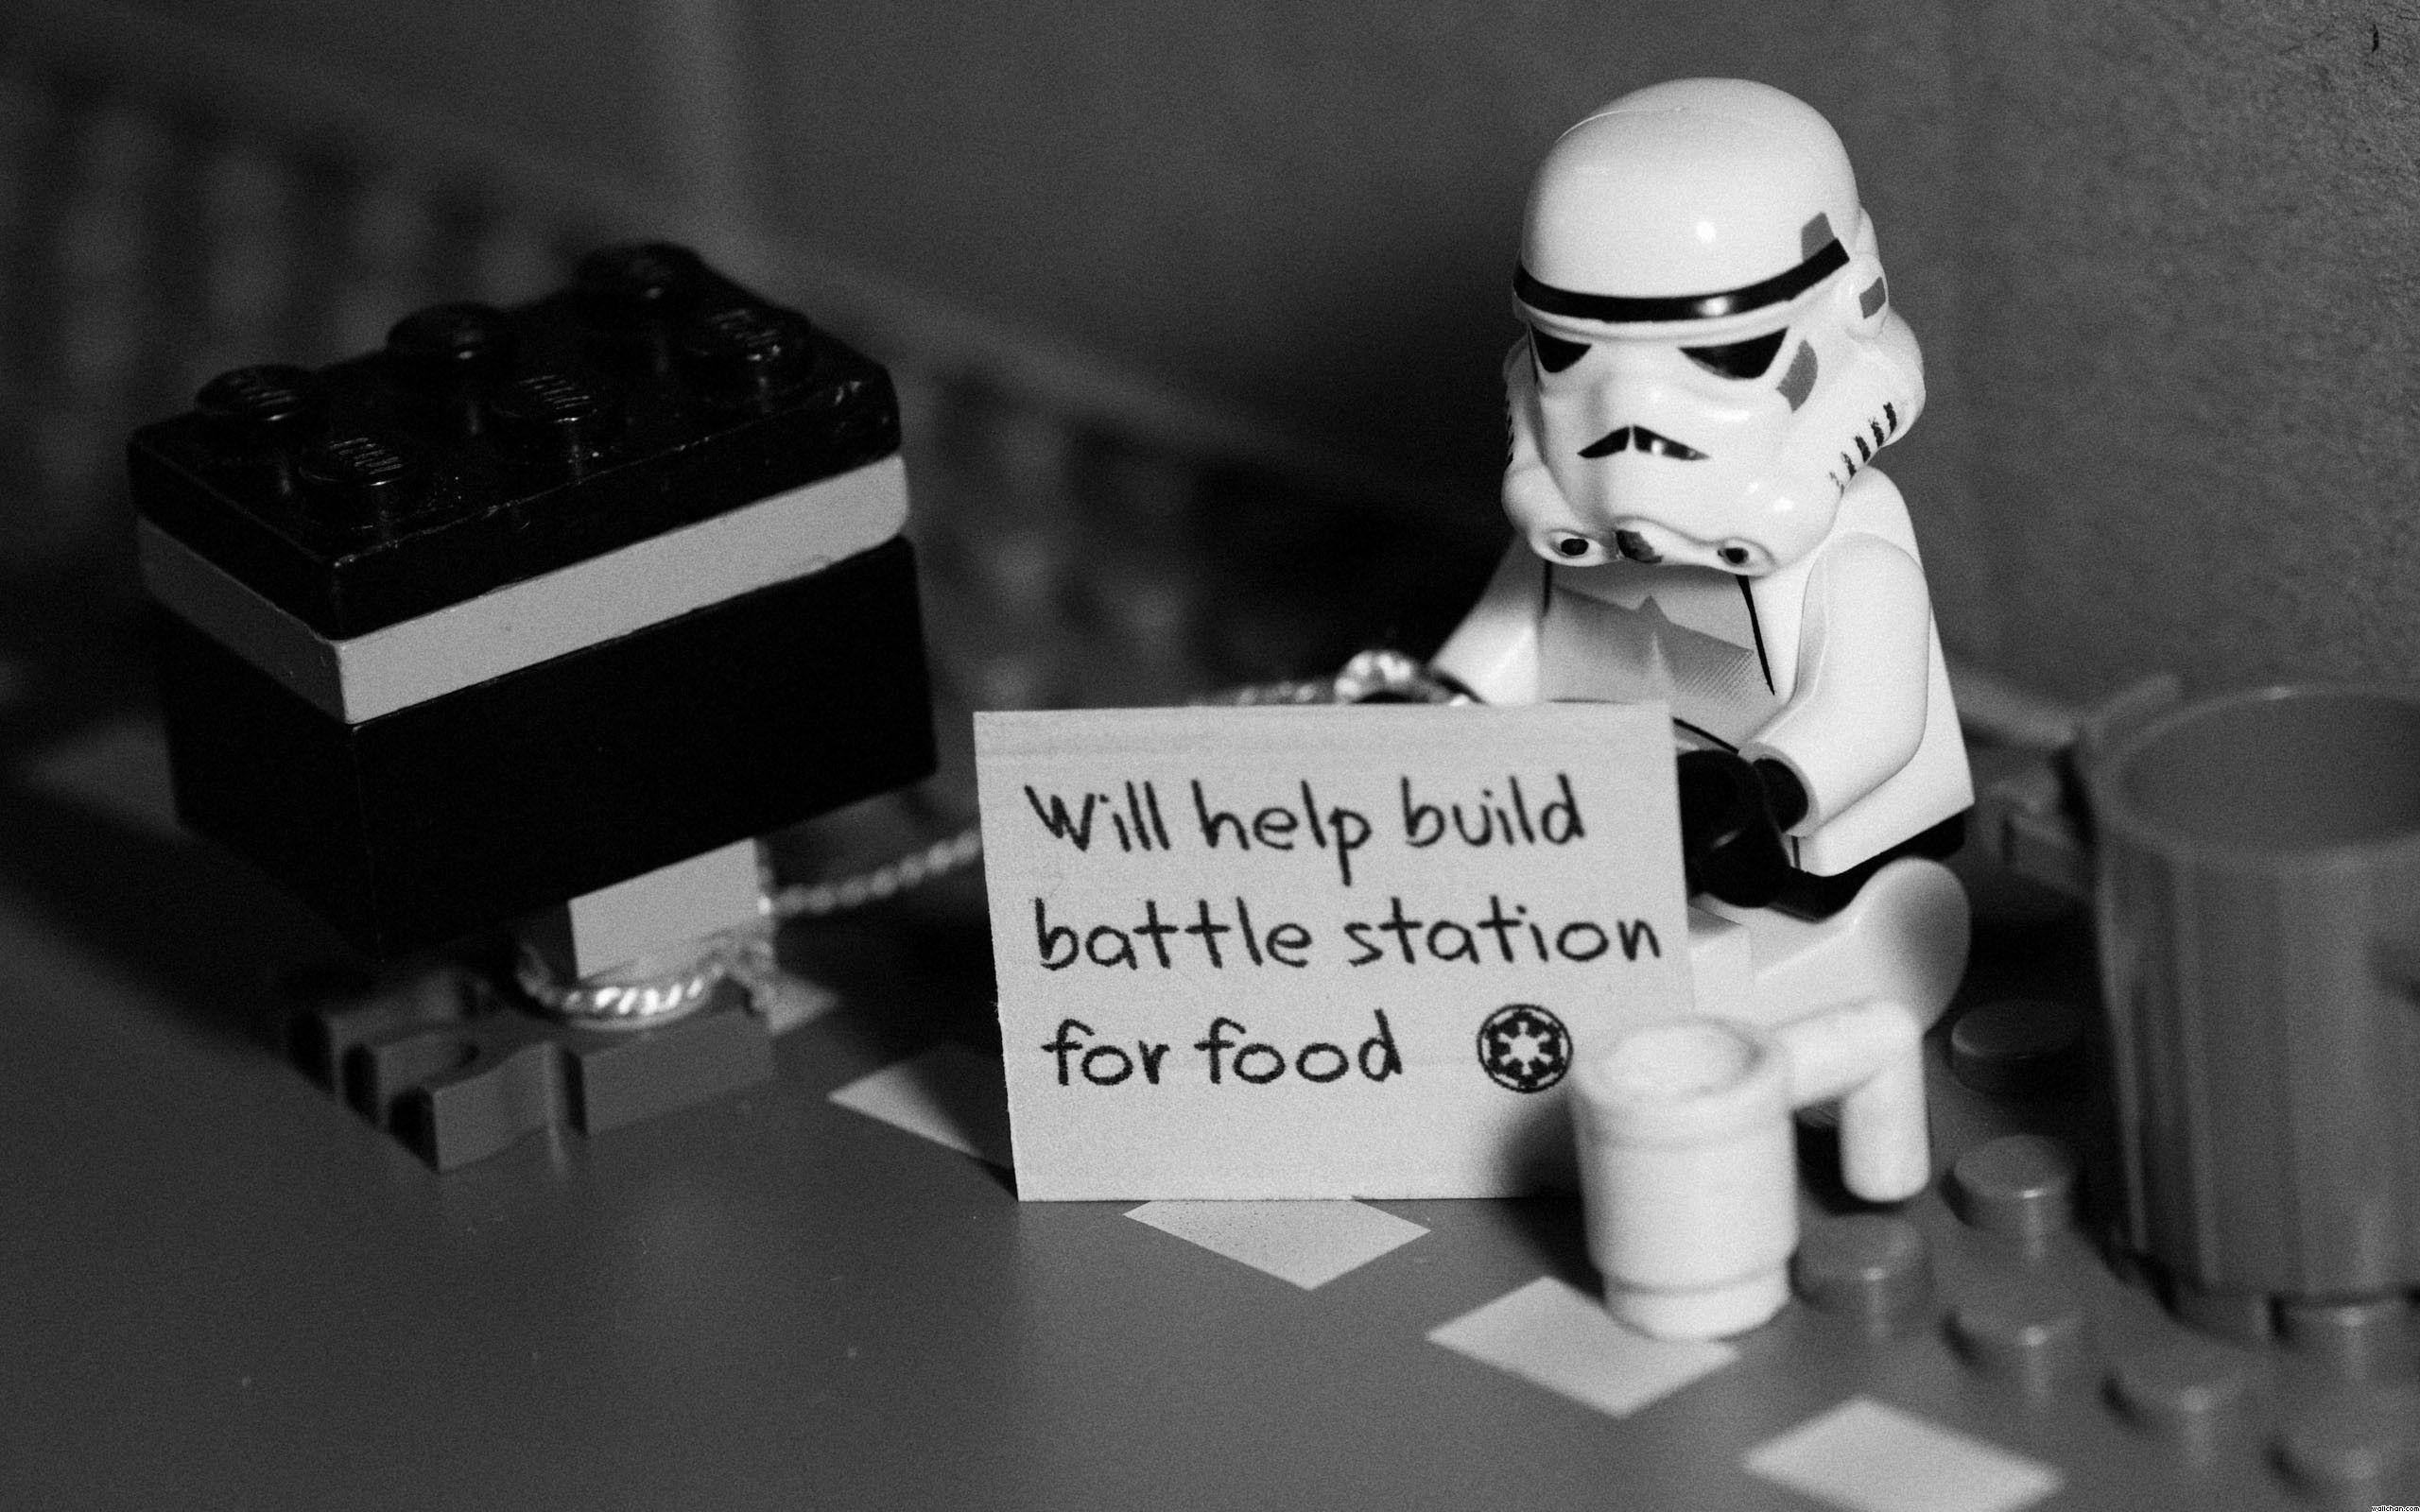 Funny Stormtrooper Wallpaper – Star Wars Wallpaper (24174442) – Fanpop